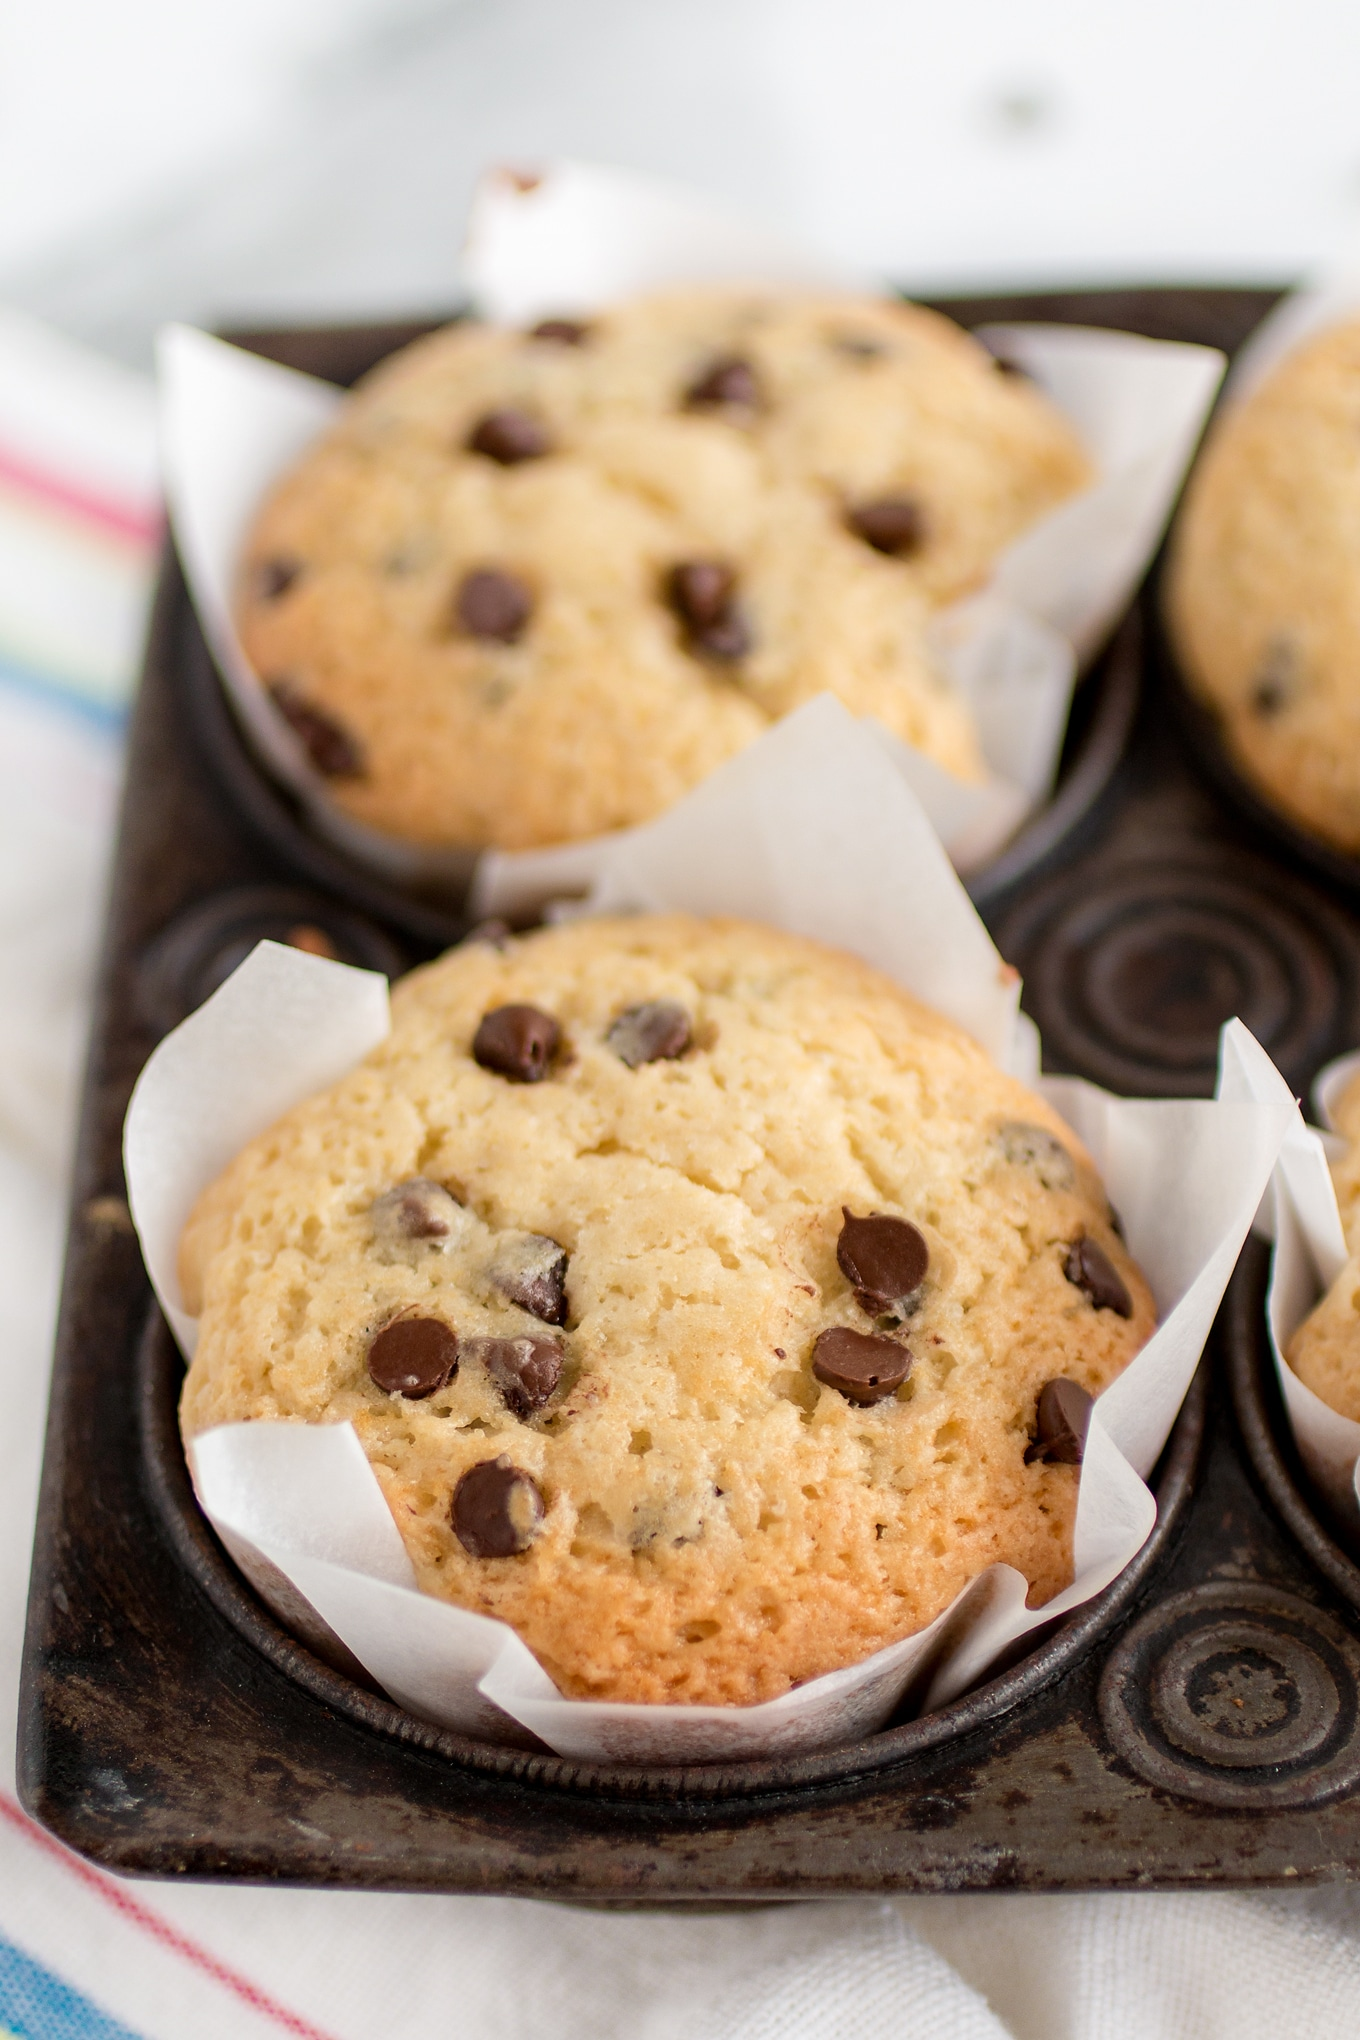 Warm Chocolate Chip Muffins